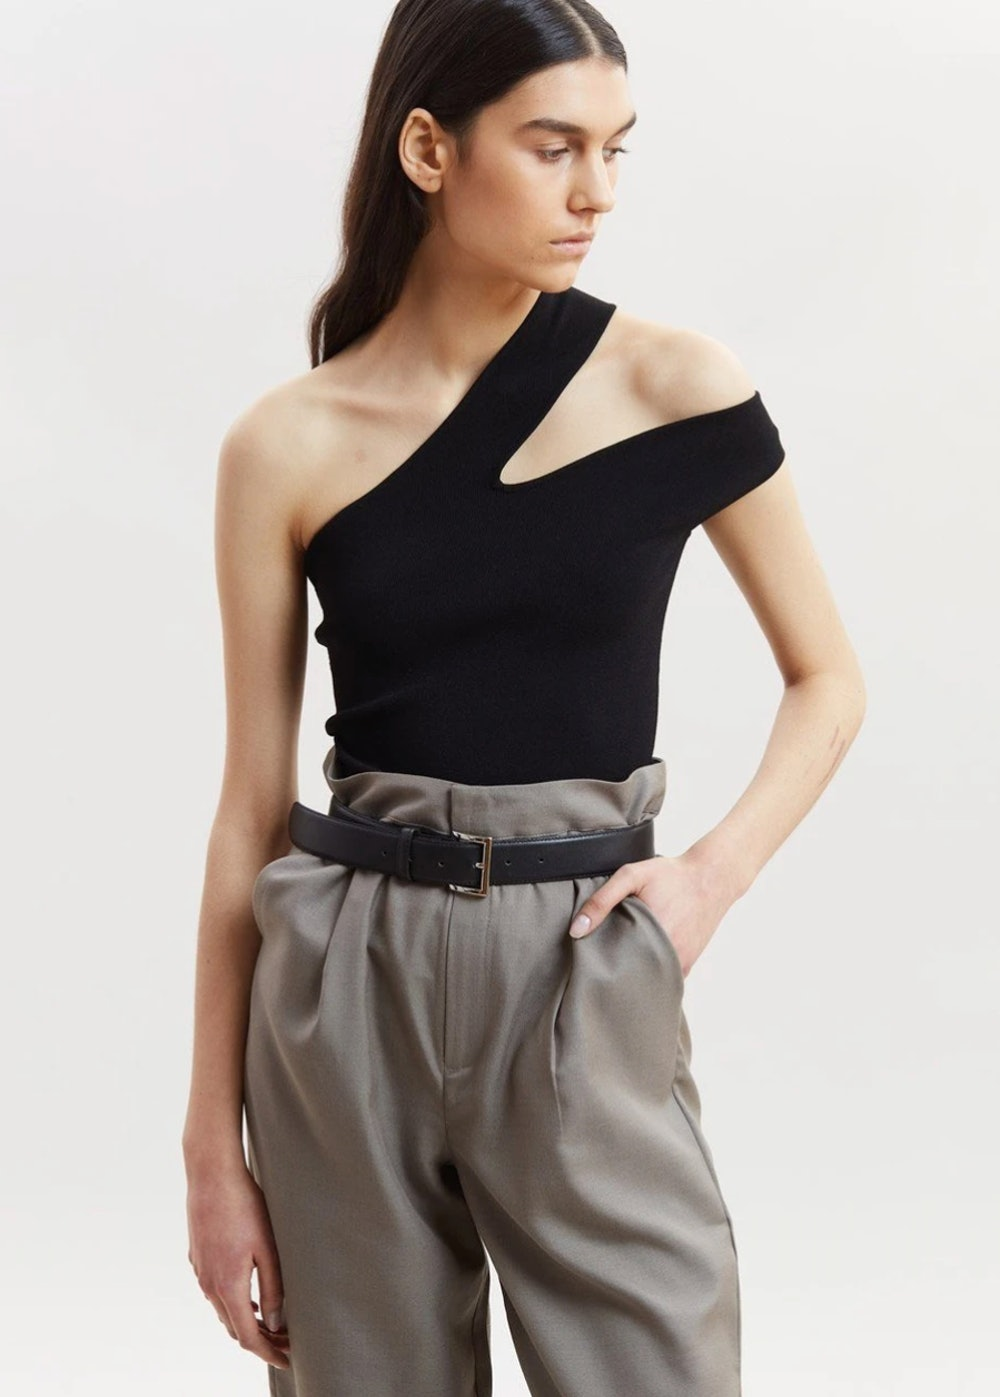 Arlet Knit Cut-Out Top